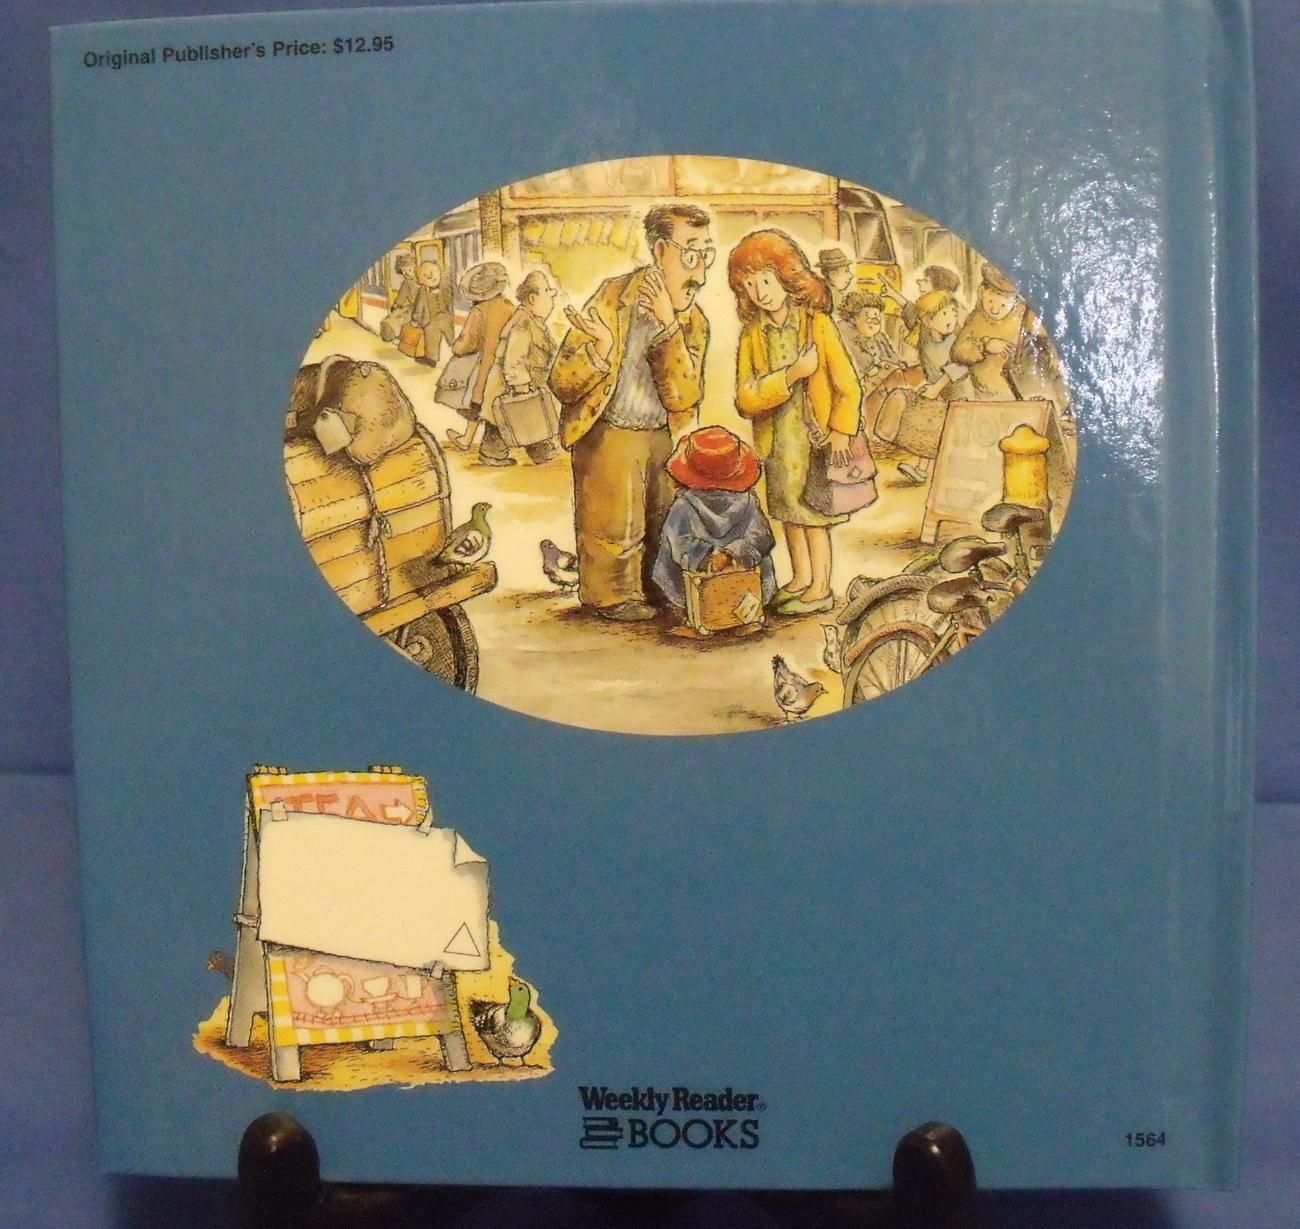 Children Books Paddington Bear Weekly Reader Book